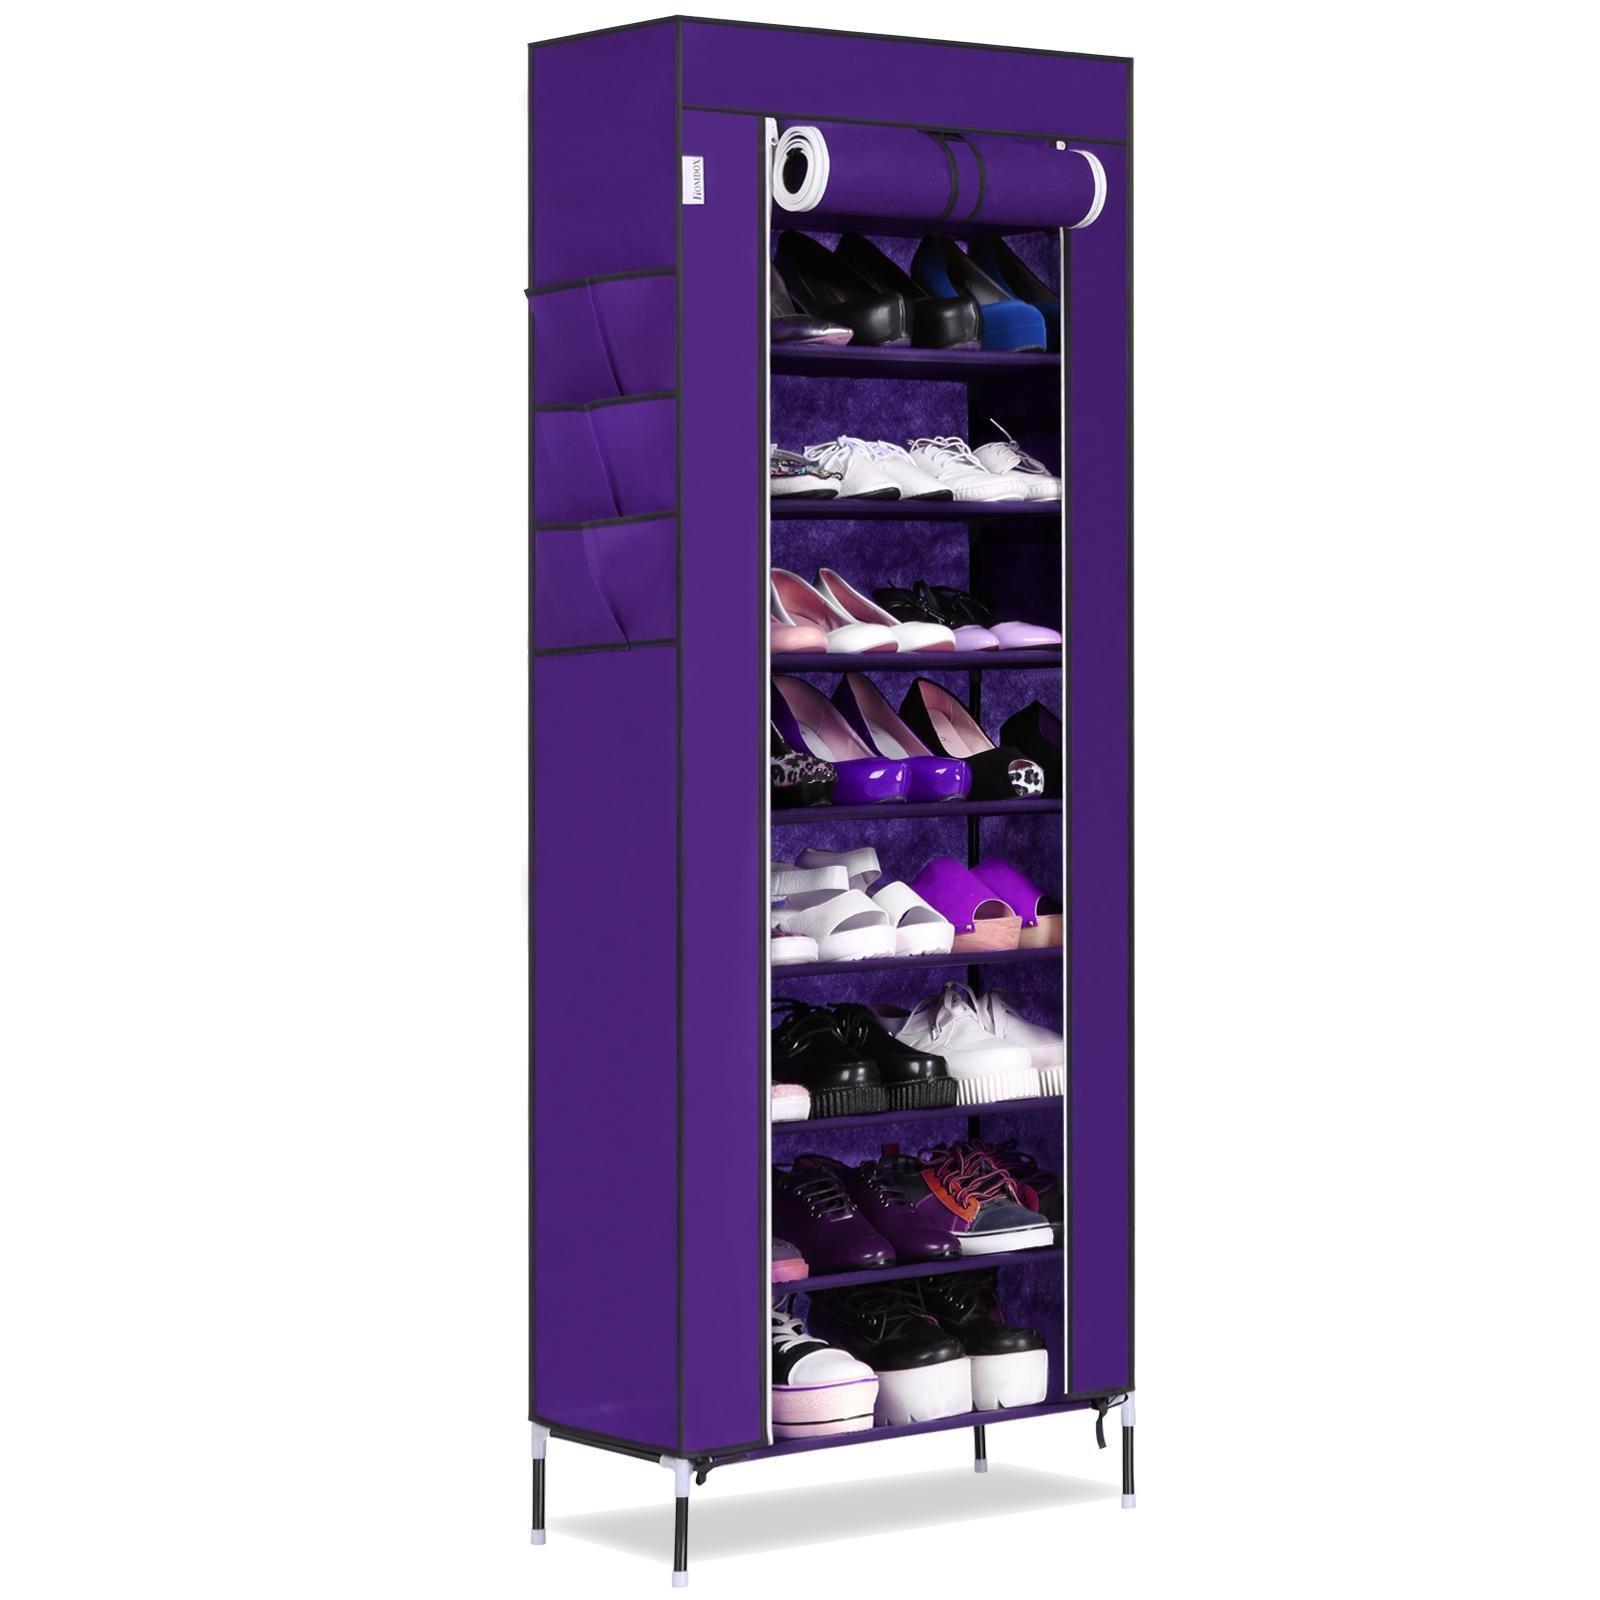 neudas 10 Tiers Shoe Rack with Cover Shoe Storage Cabinet Organizer Portable Shoe Tower Rack, 23.4 x 11.7 x 65.5inch (Purple)